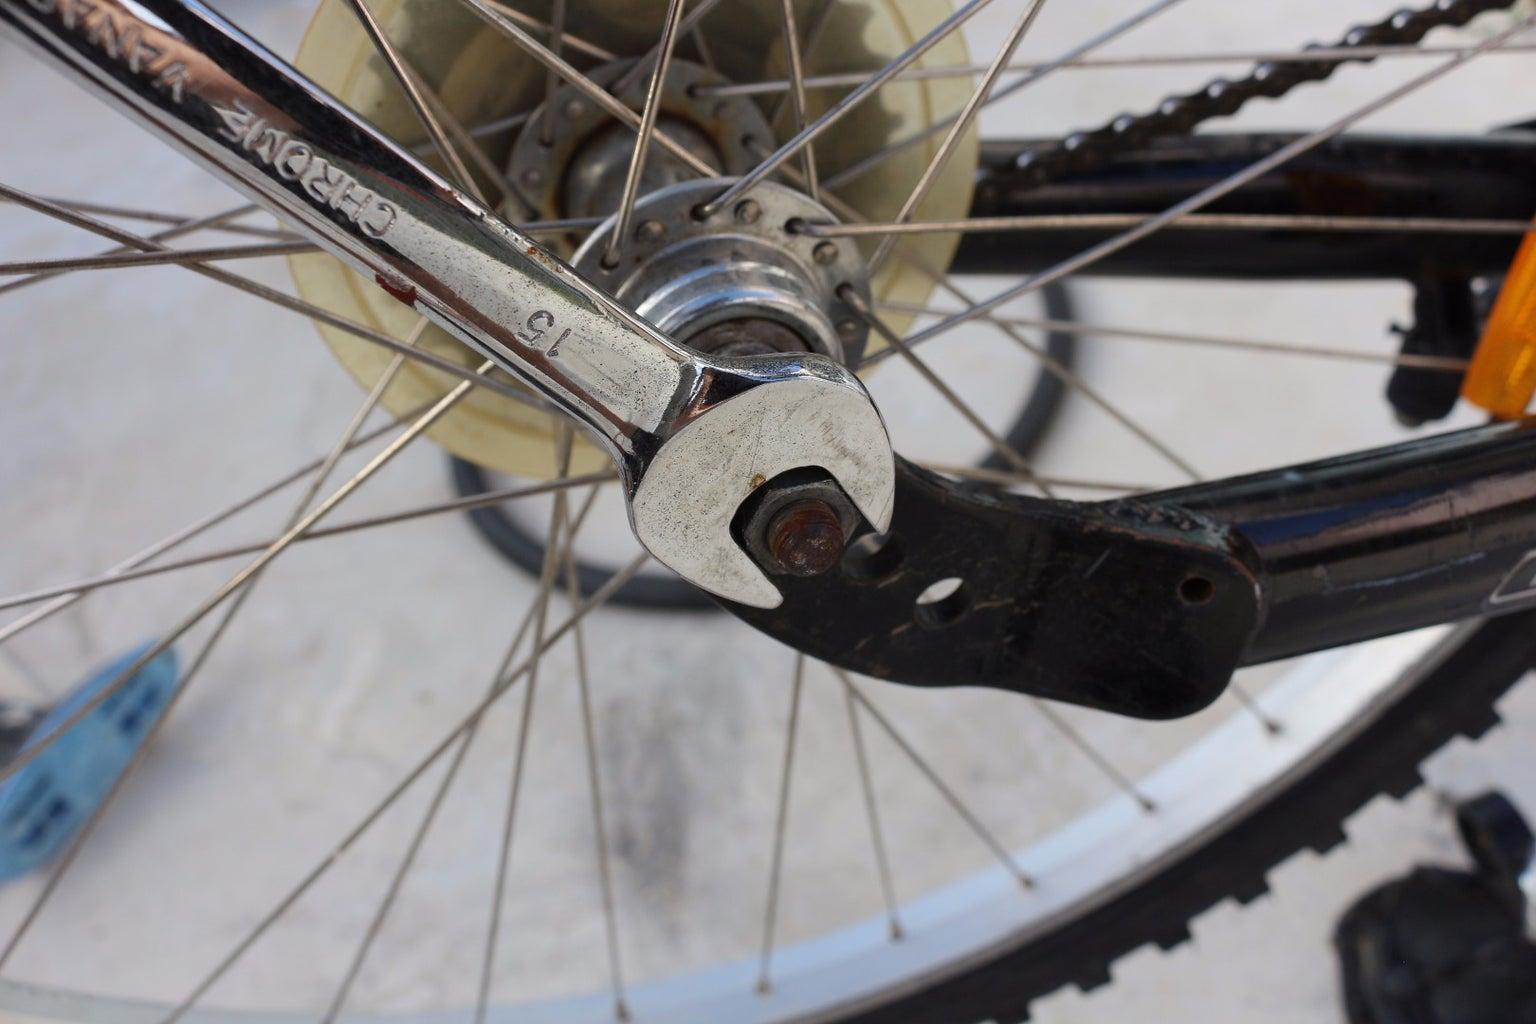 Reinstalling Wheel Onto Bike